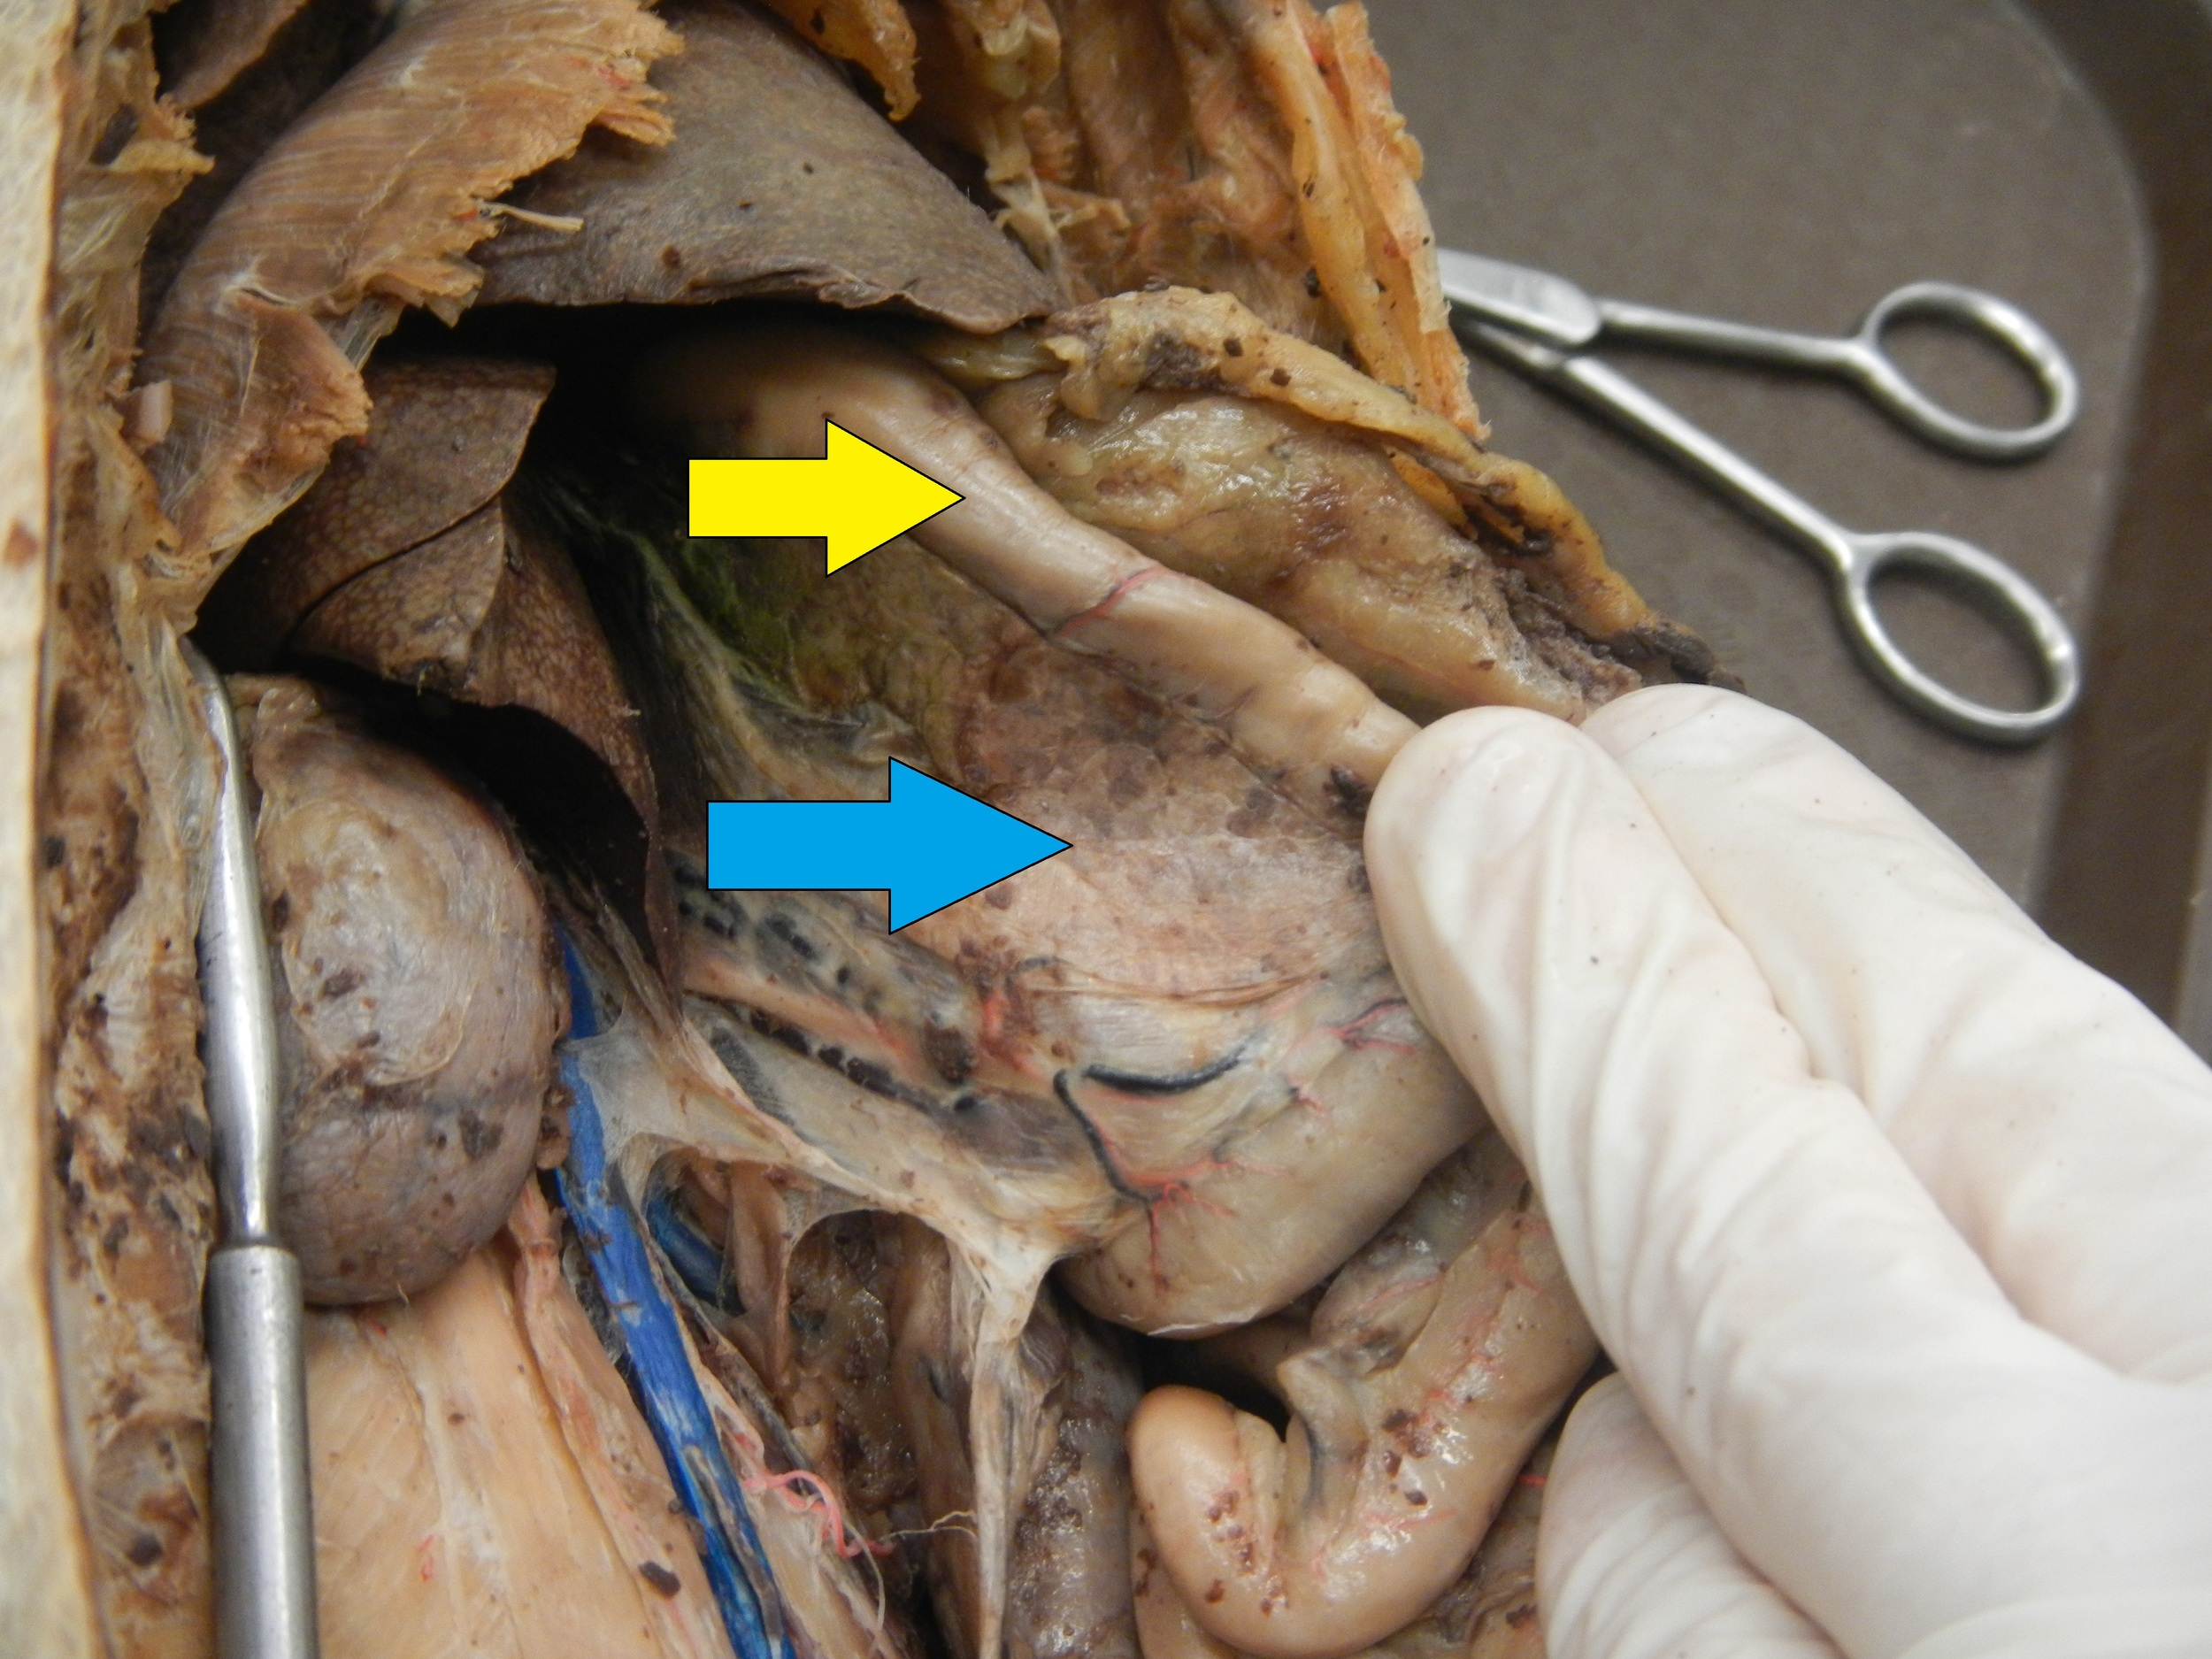 Blue - Pancreas  Yellow - Small Intestine